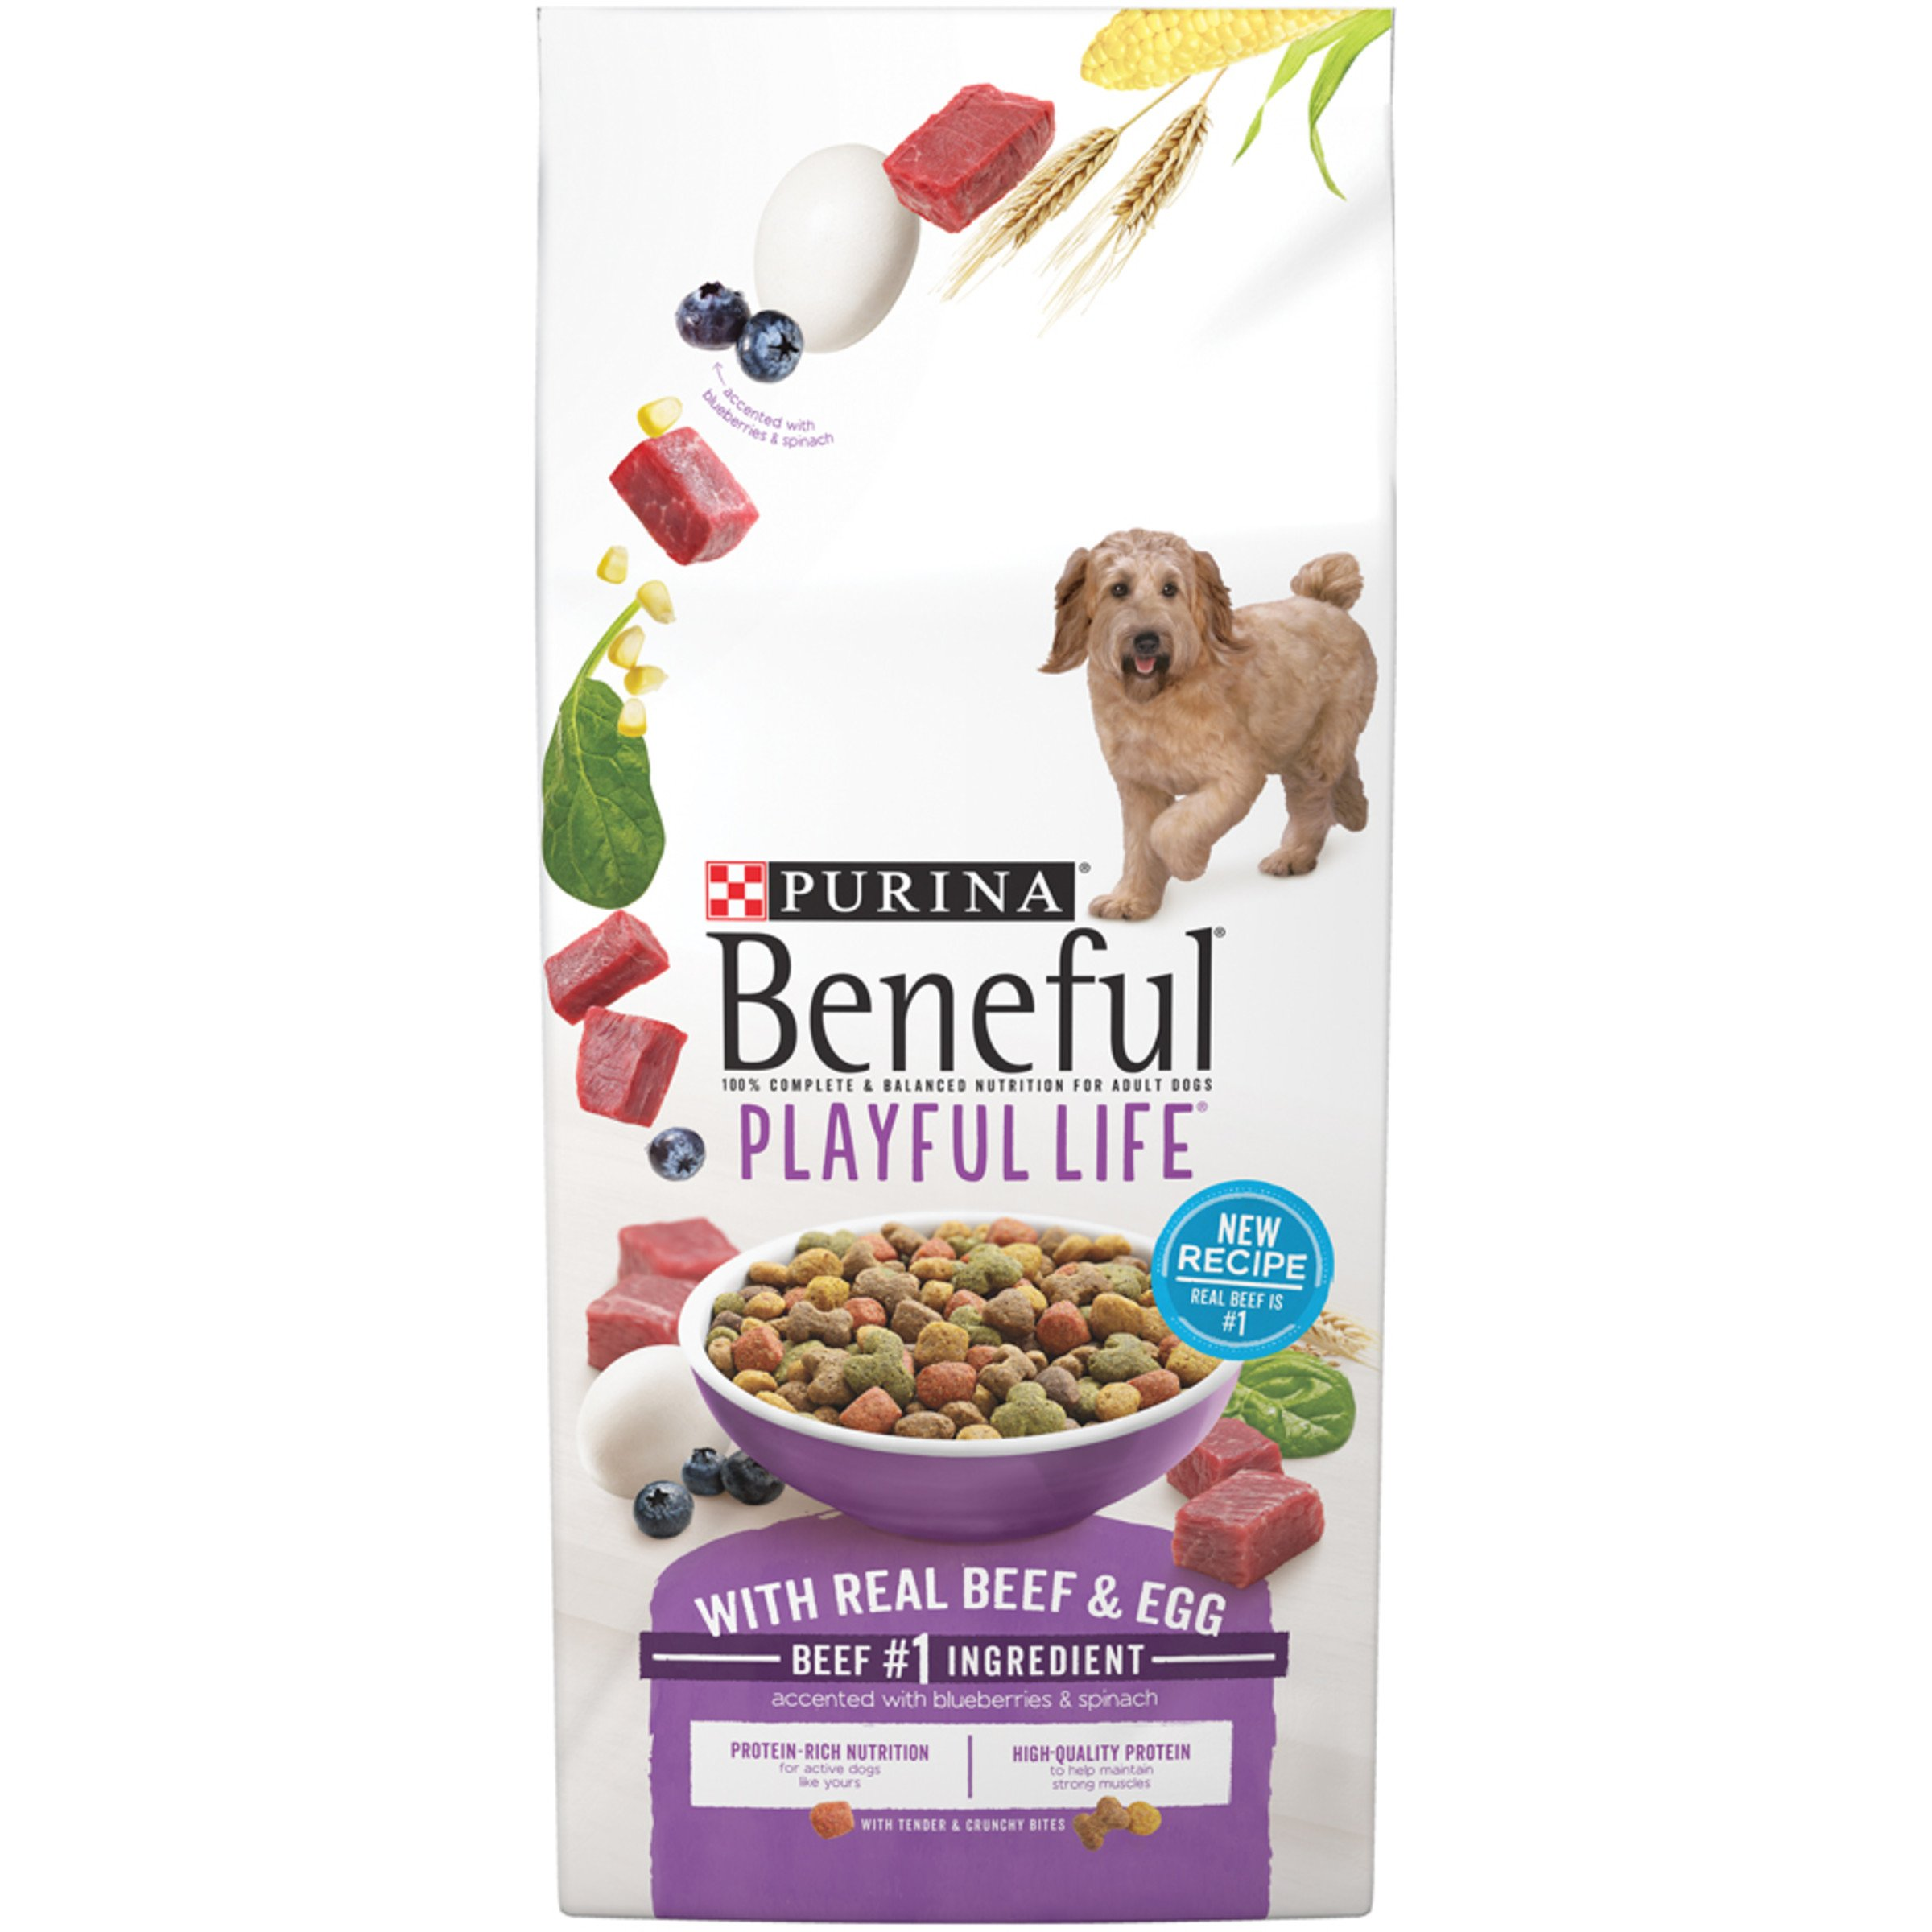 Purina Beneful Playful Life With Real Beef & Egg Dry Dog Food - 31.1 lb. Bag by Purina Beneful (Image #1)